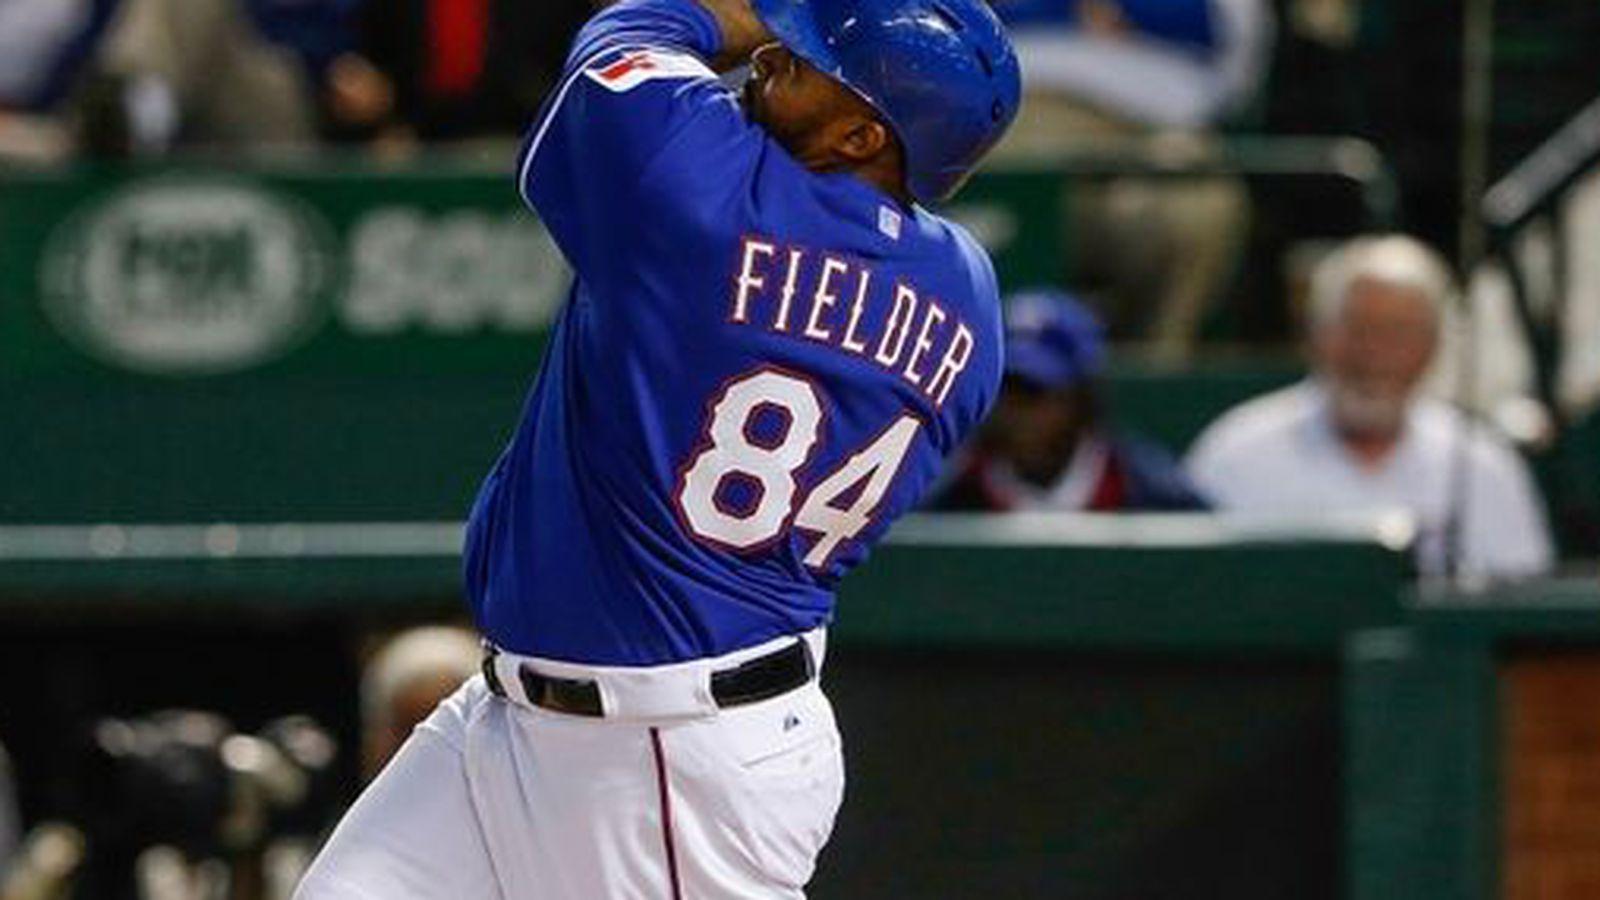 Prince-fielder.0